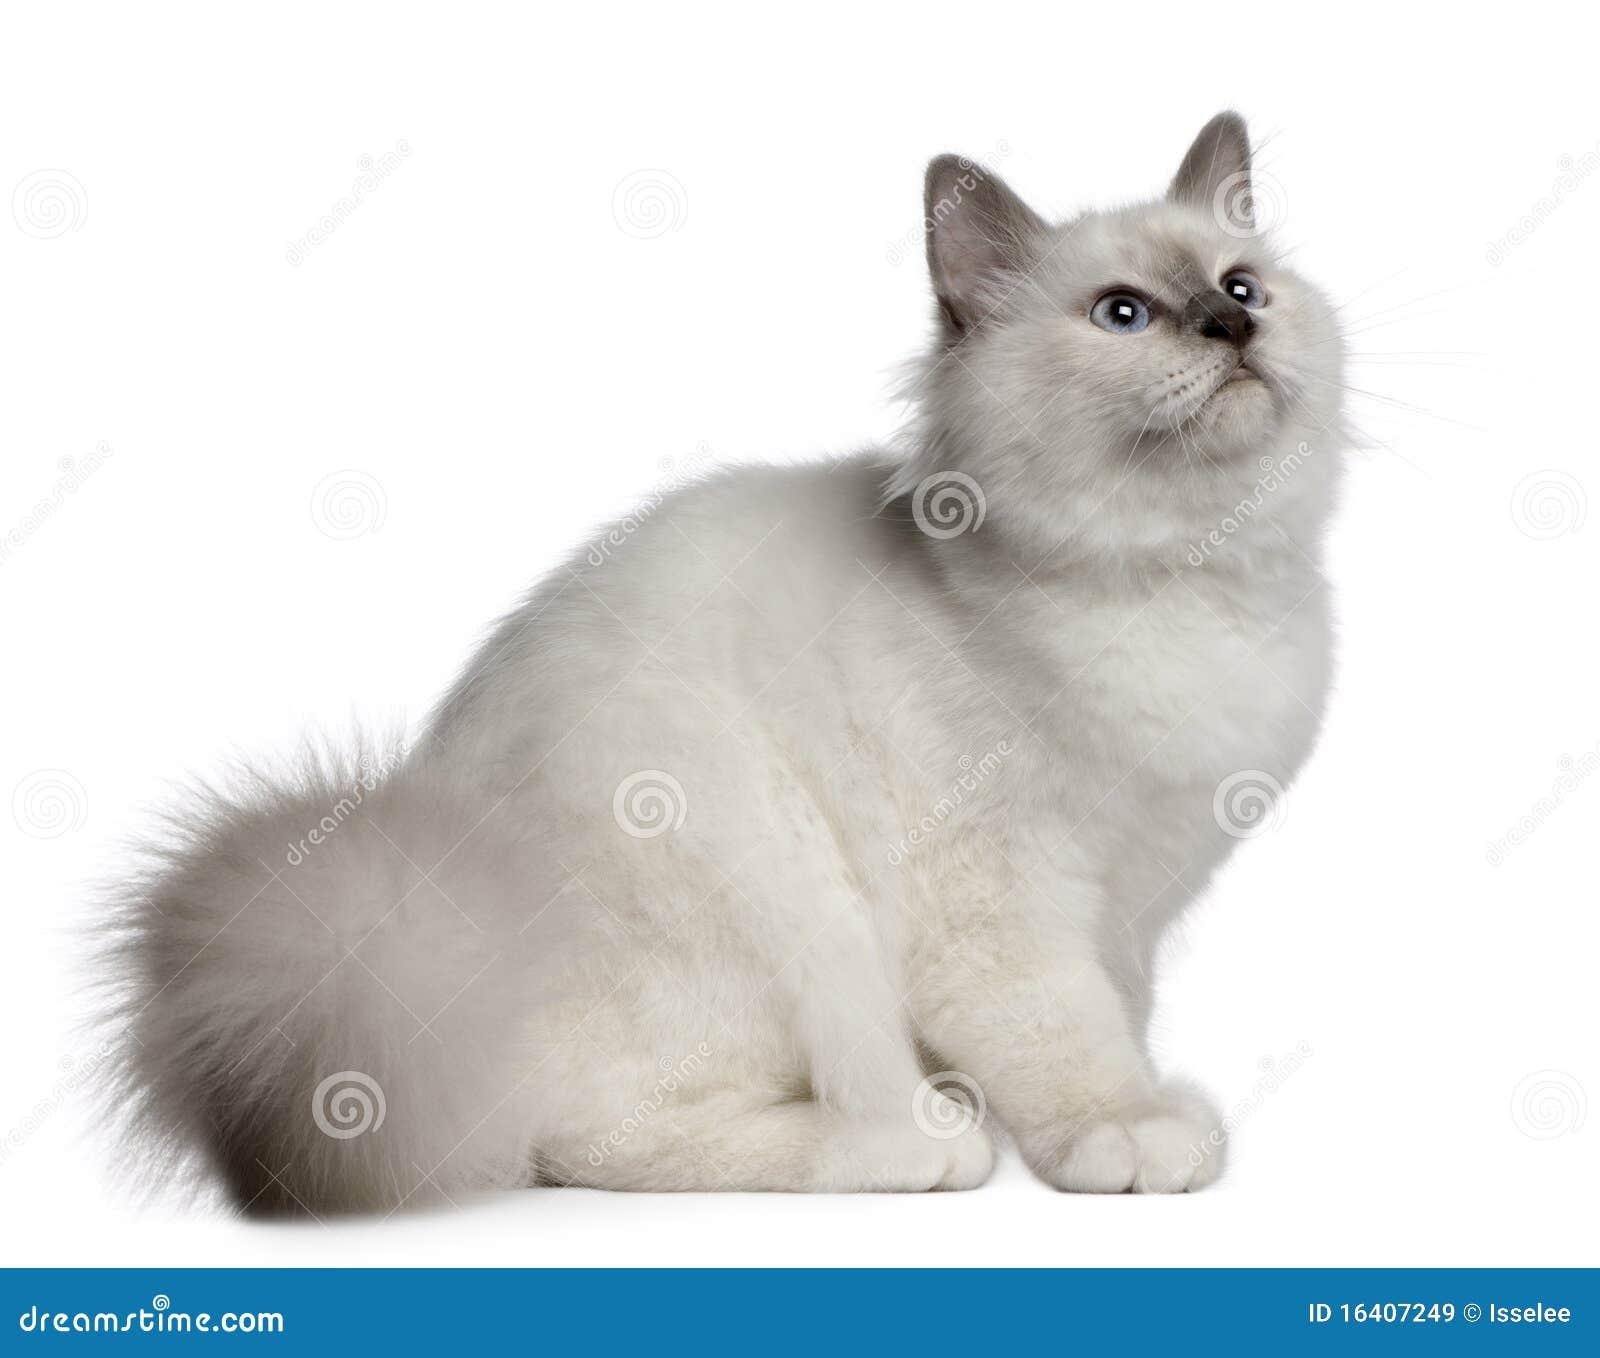 pandora cat charm